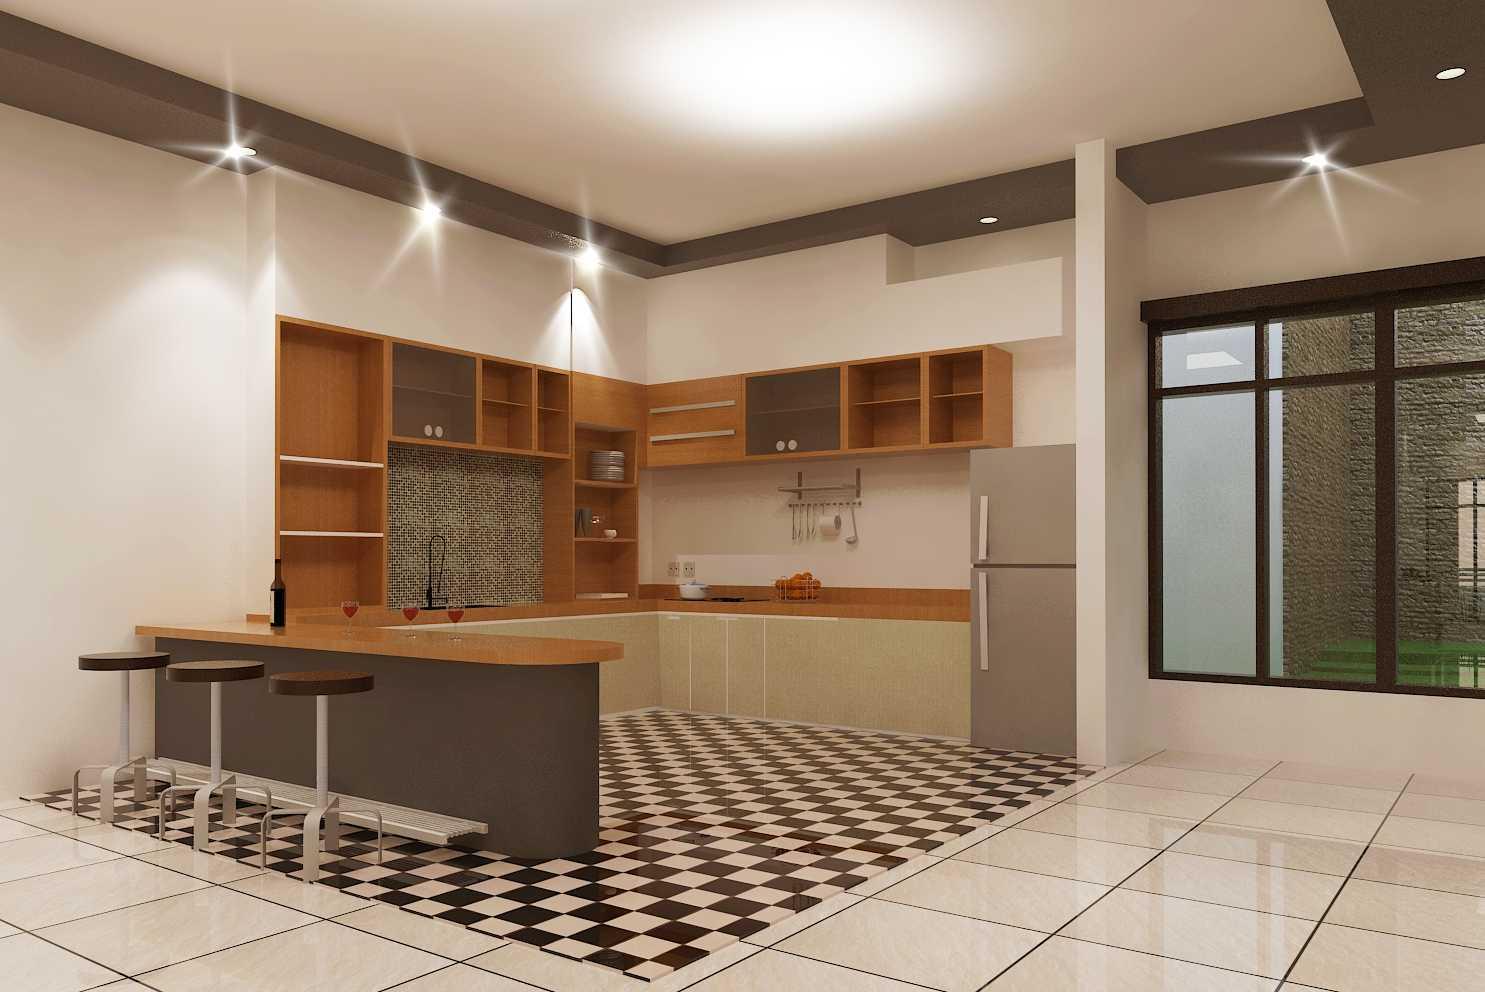 Archdesignbuild7 Rumah Tinggal 2 Lantai ( Minen )  Jl. Alfa Ii, Cigadung, Bandung Jl. Alfa Ii, Cigadung, Bandung Kitchen Minimalis 20150